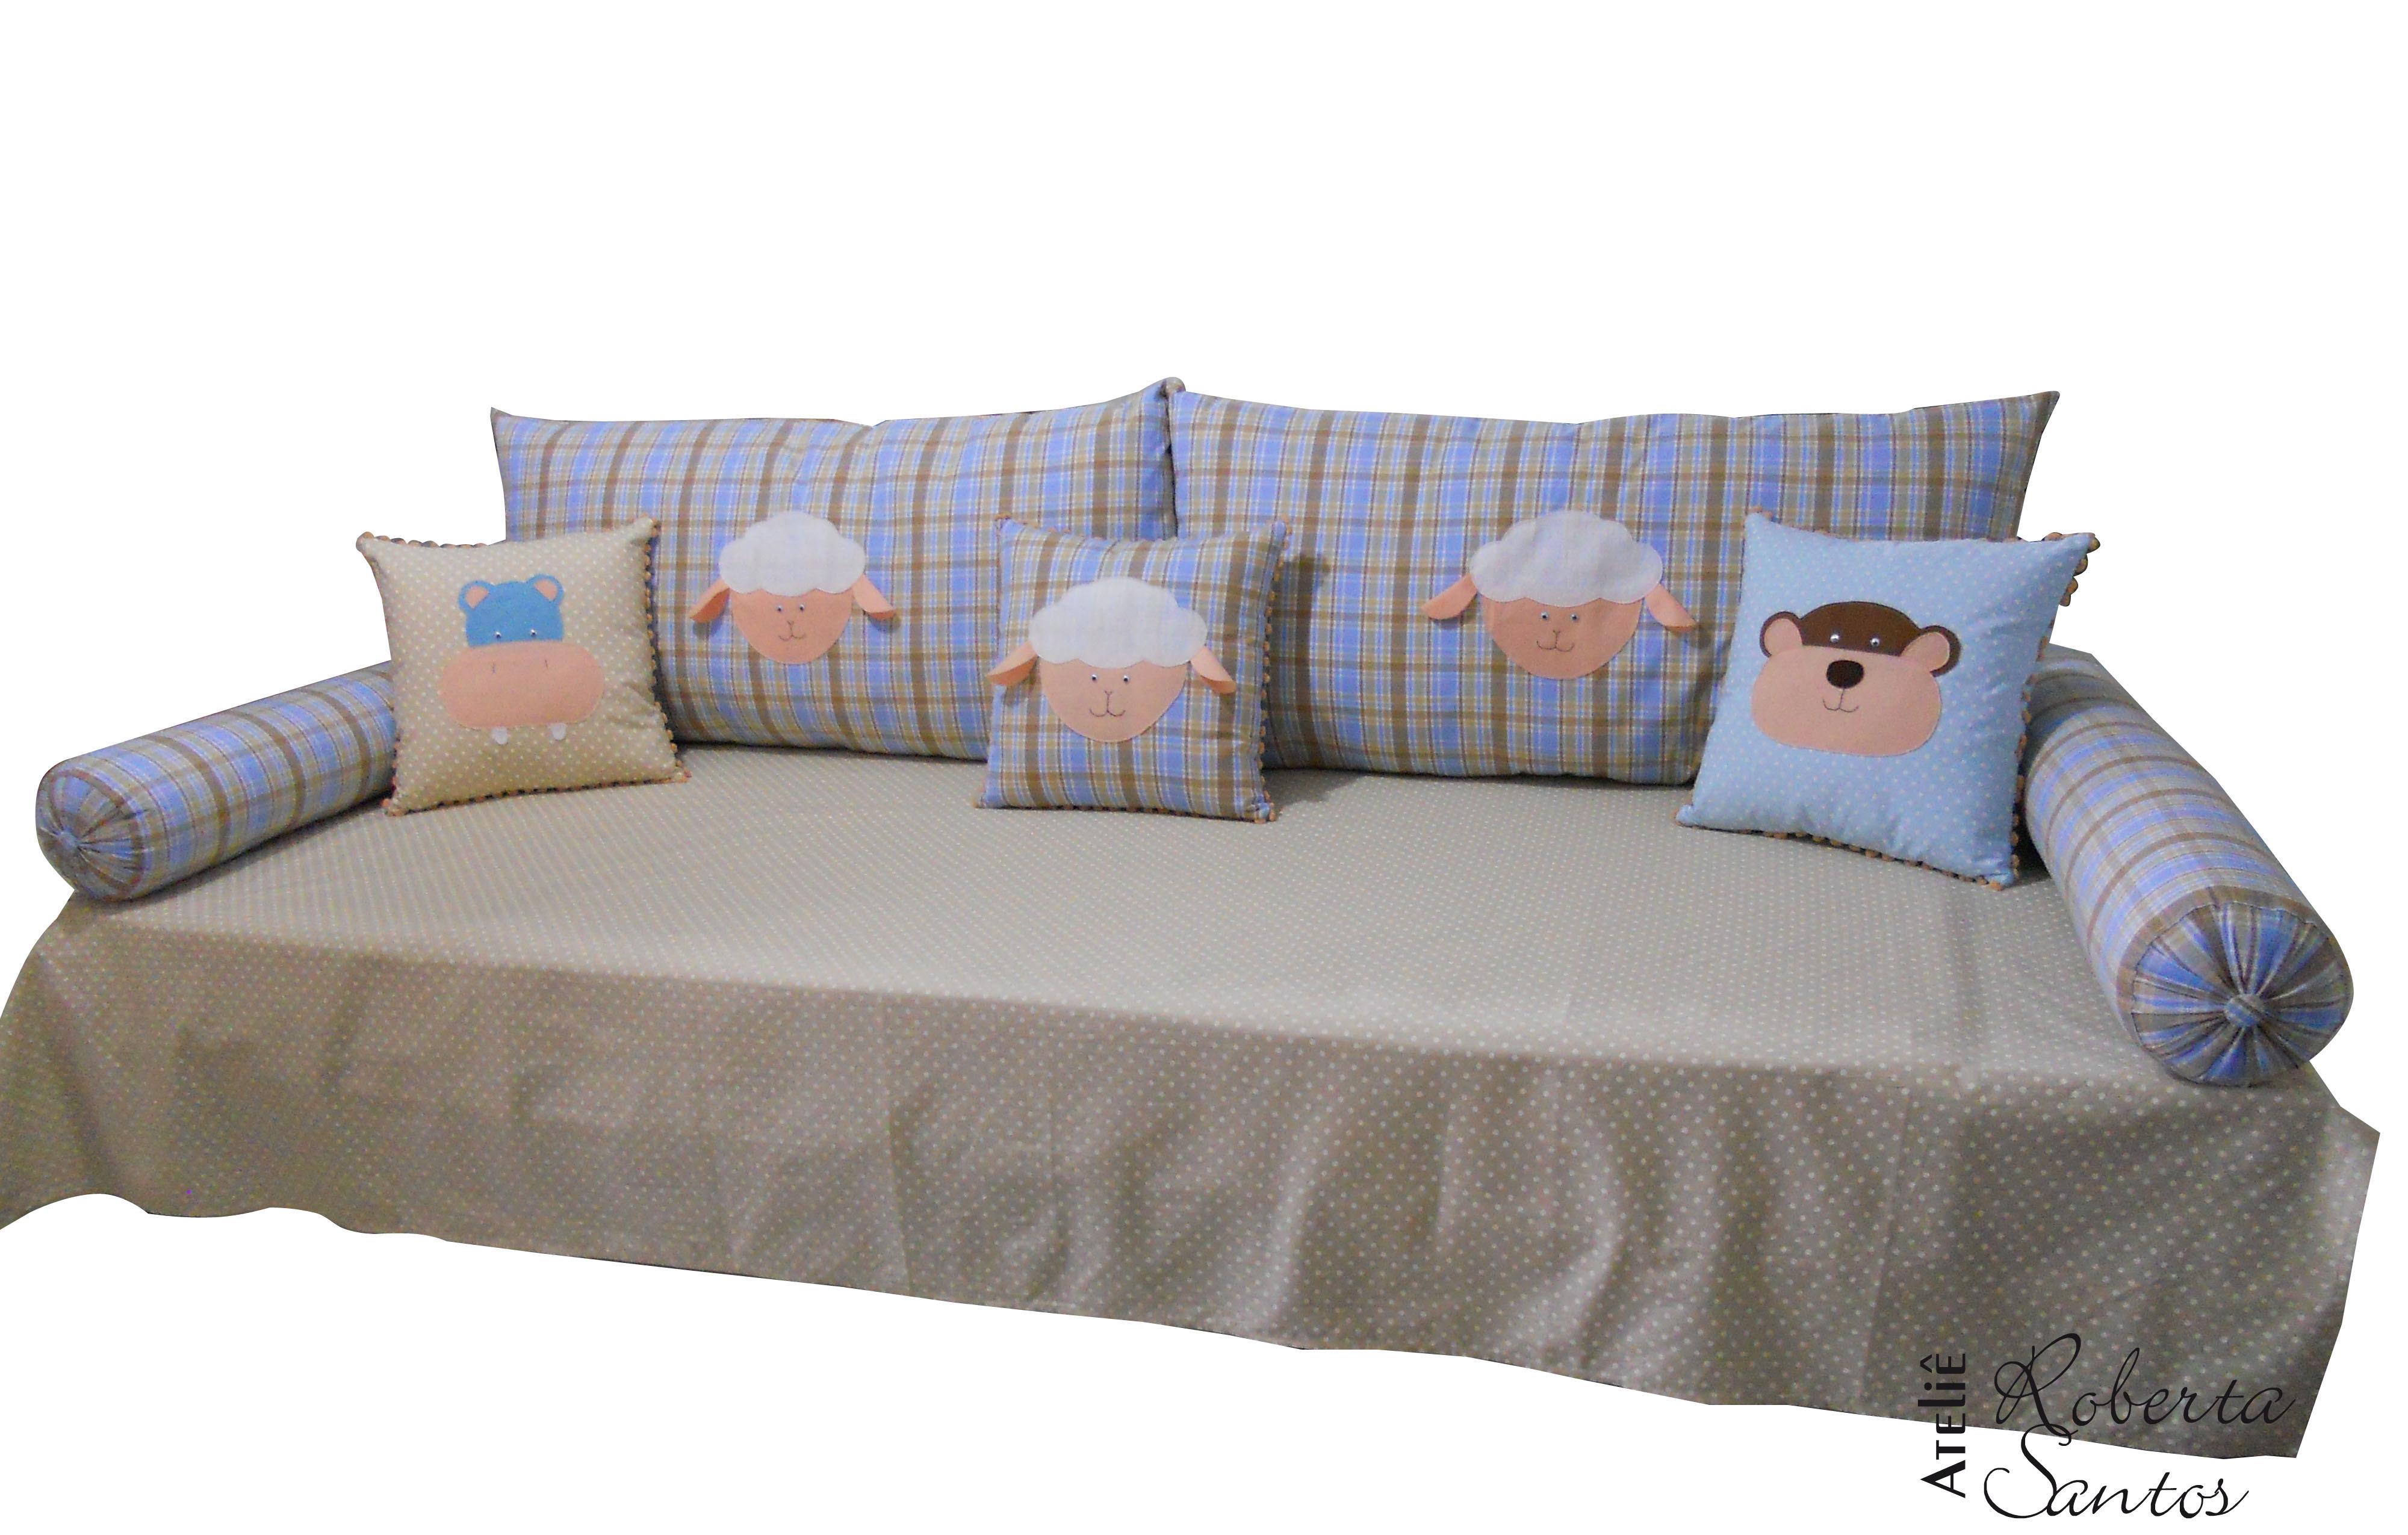 Kit para cama auxiliar safari ateli roberta santos elo7 for Cama original